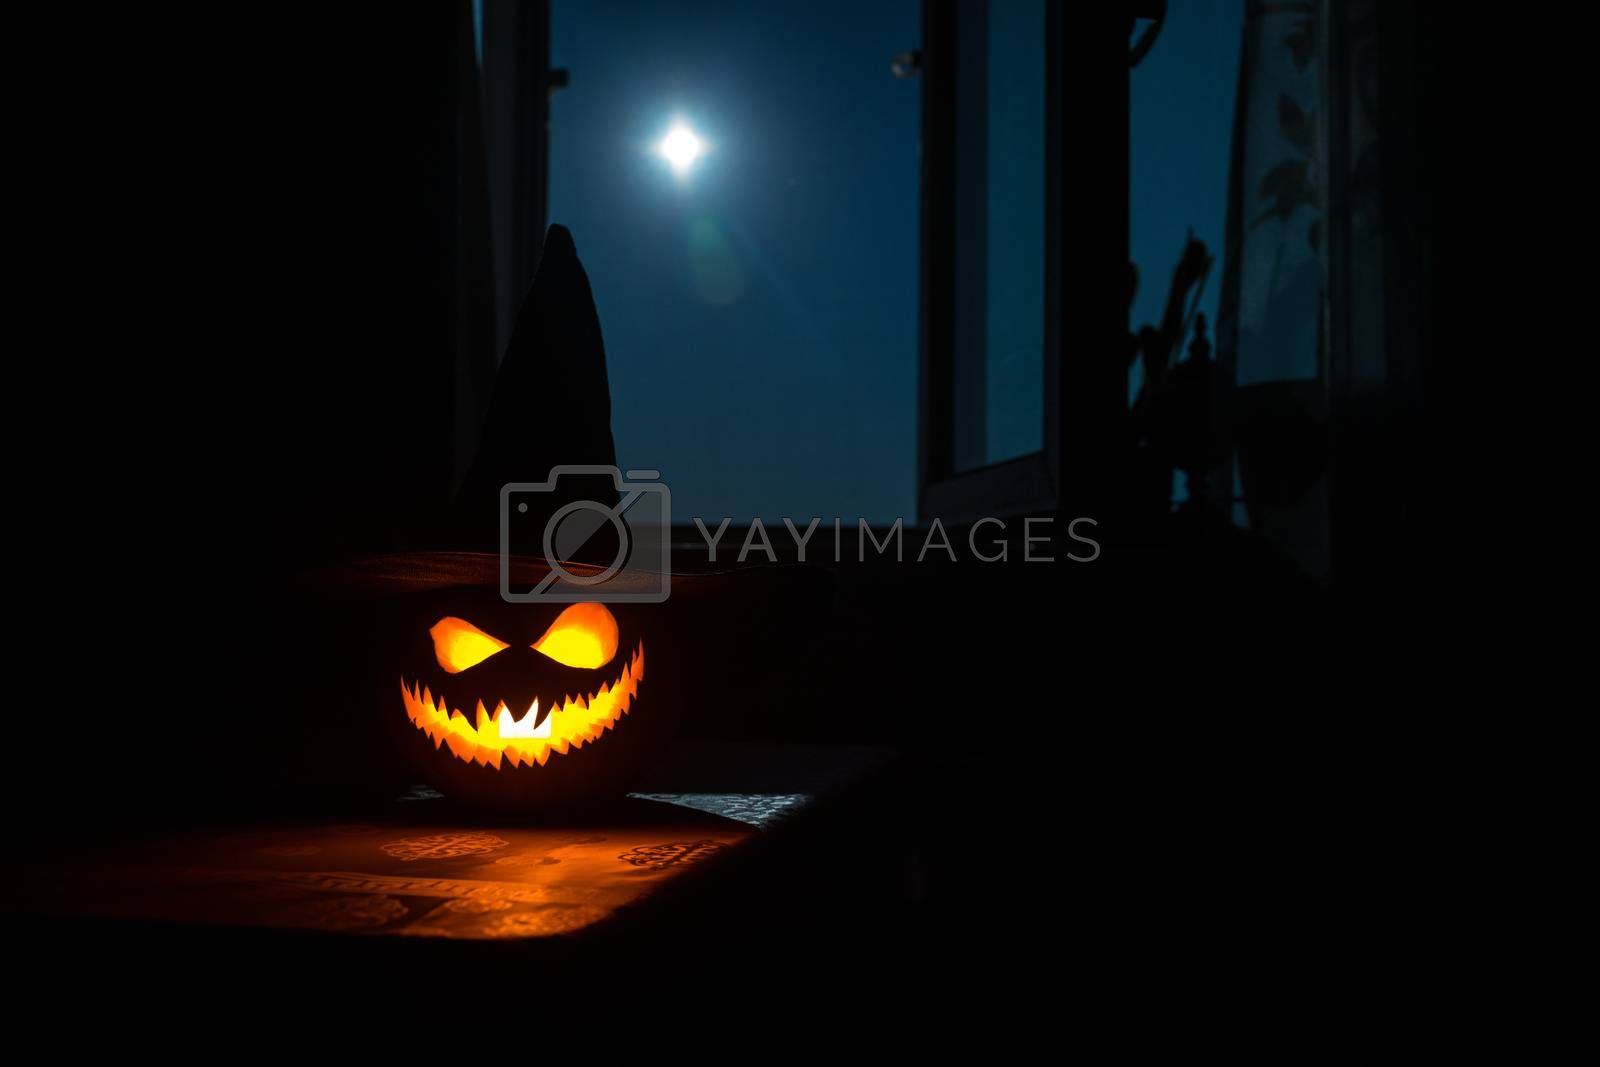 Scary Halloween pumpkin in the mystical house window at night or halloween pumpkin in night on room with blue window. Symbol of halloween in window. by Zeferli